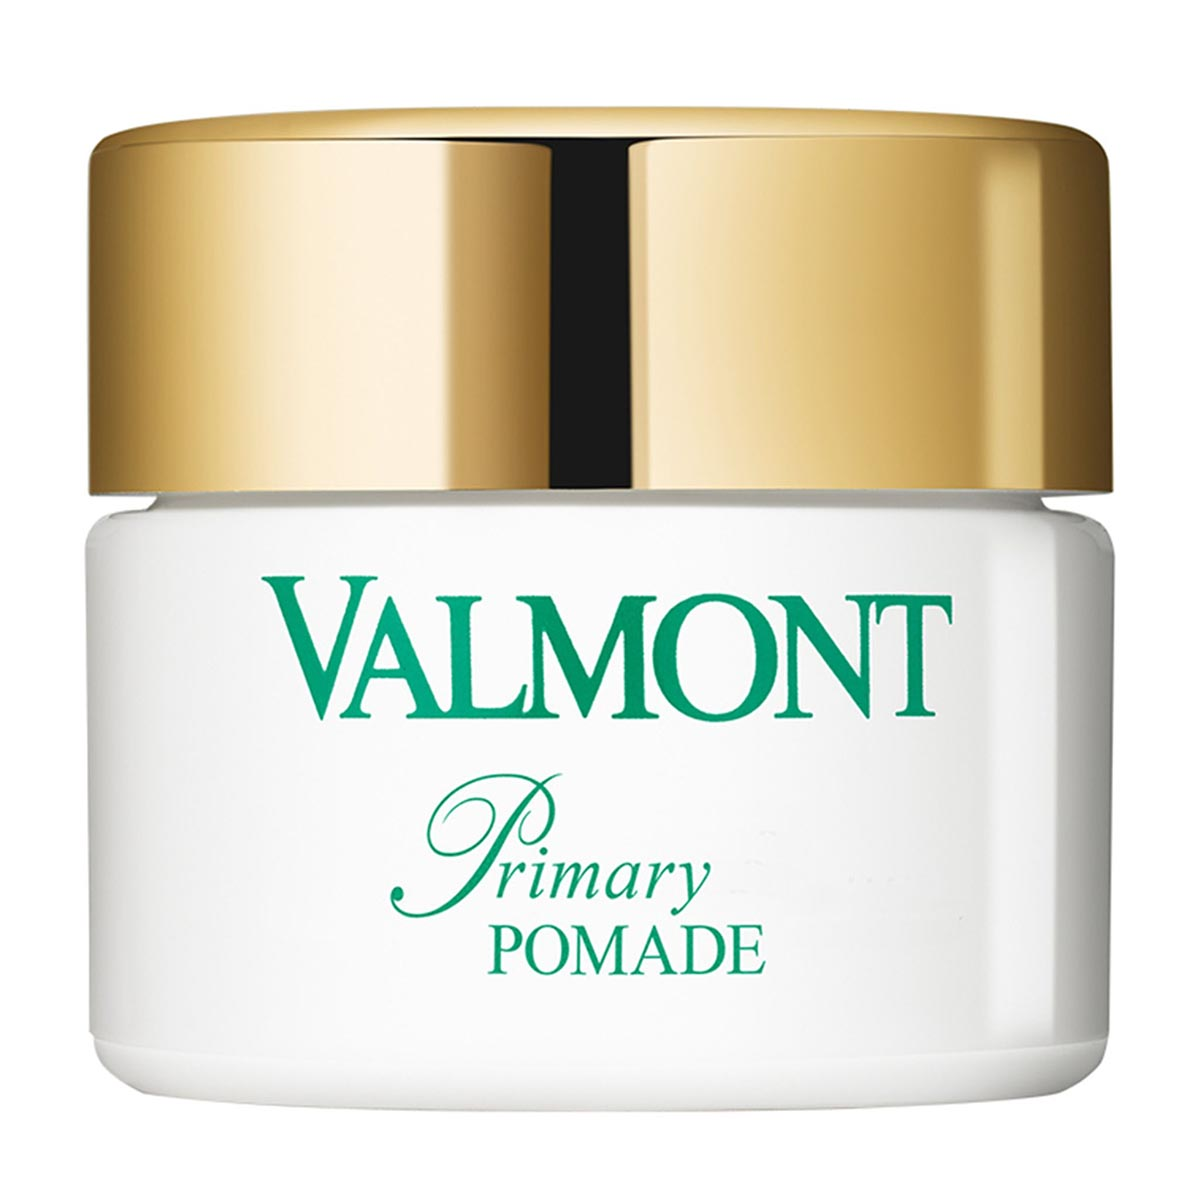 Valmont primary pomade 50ml